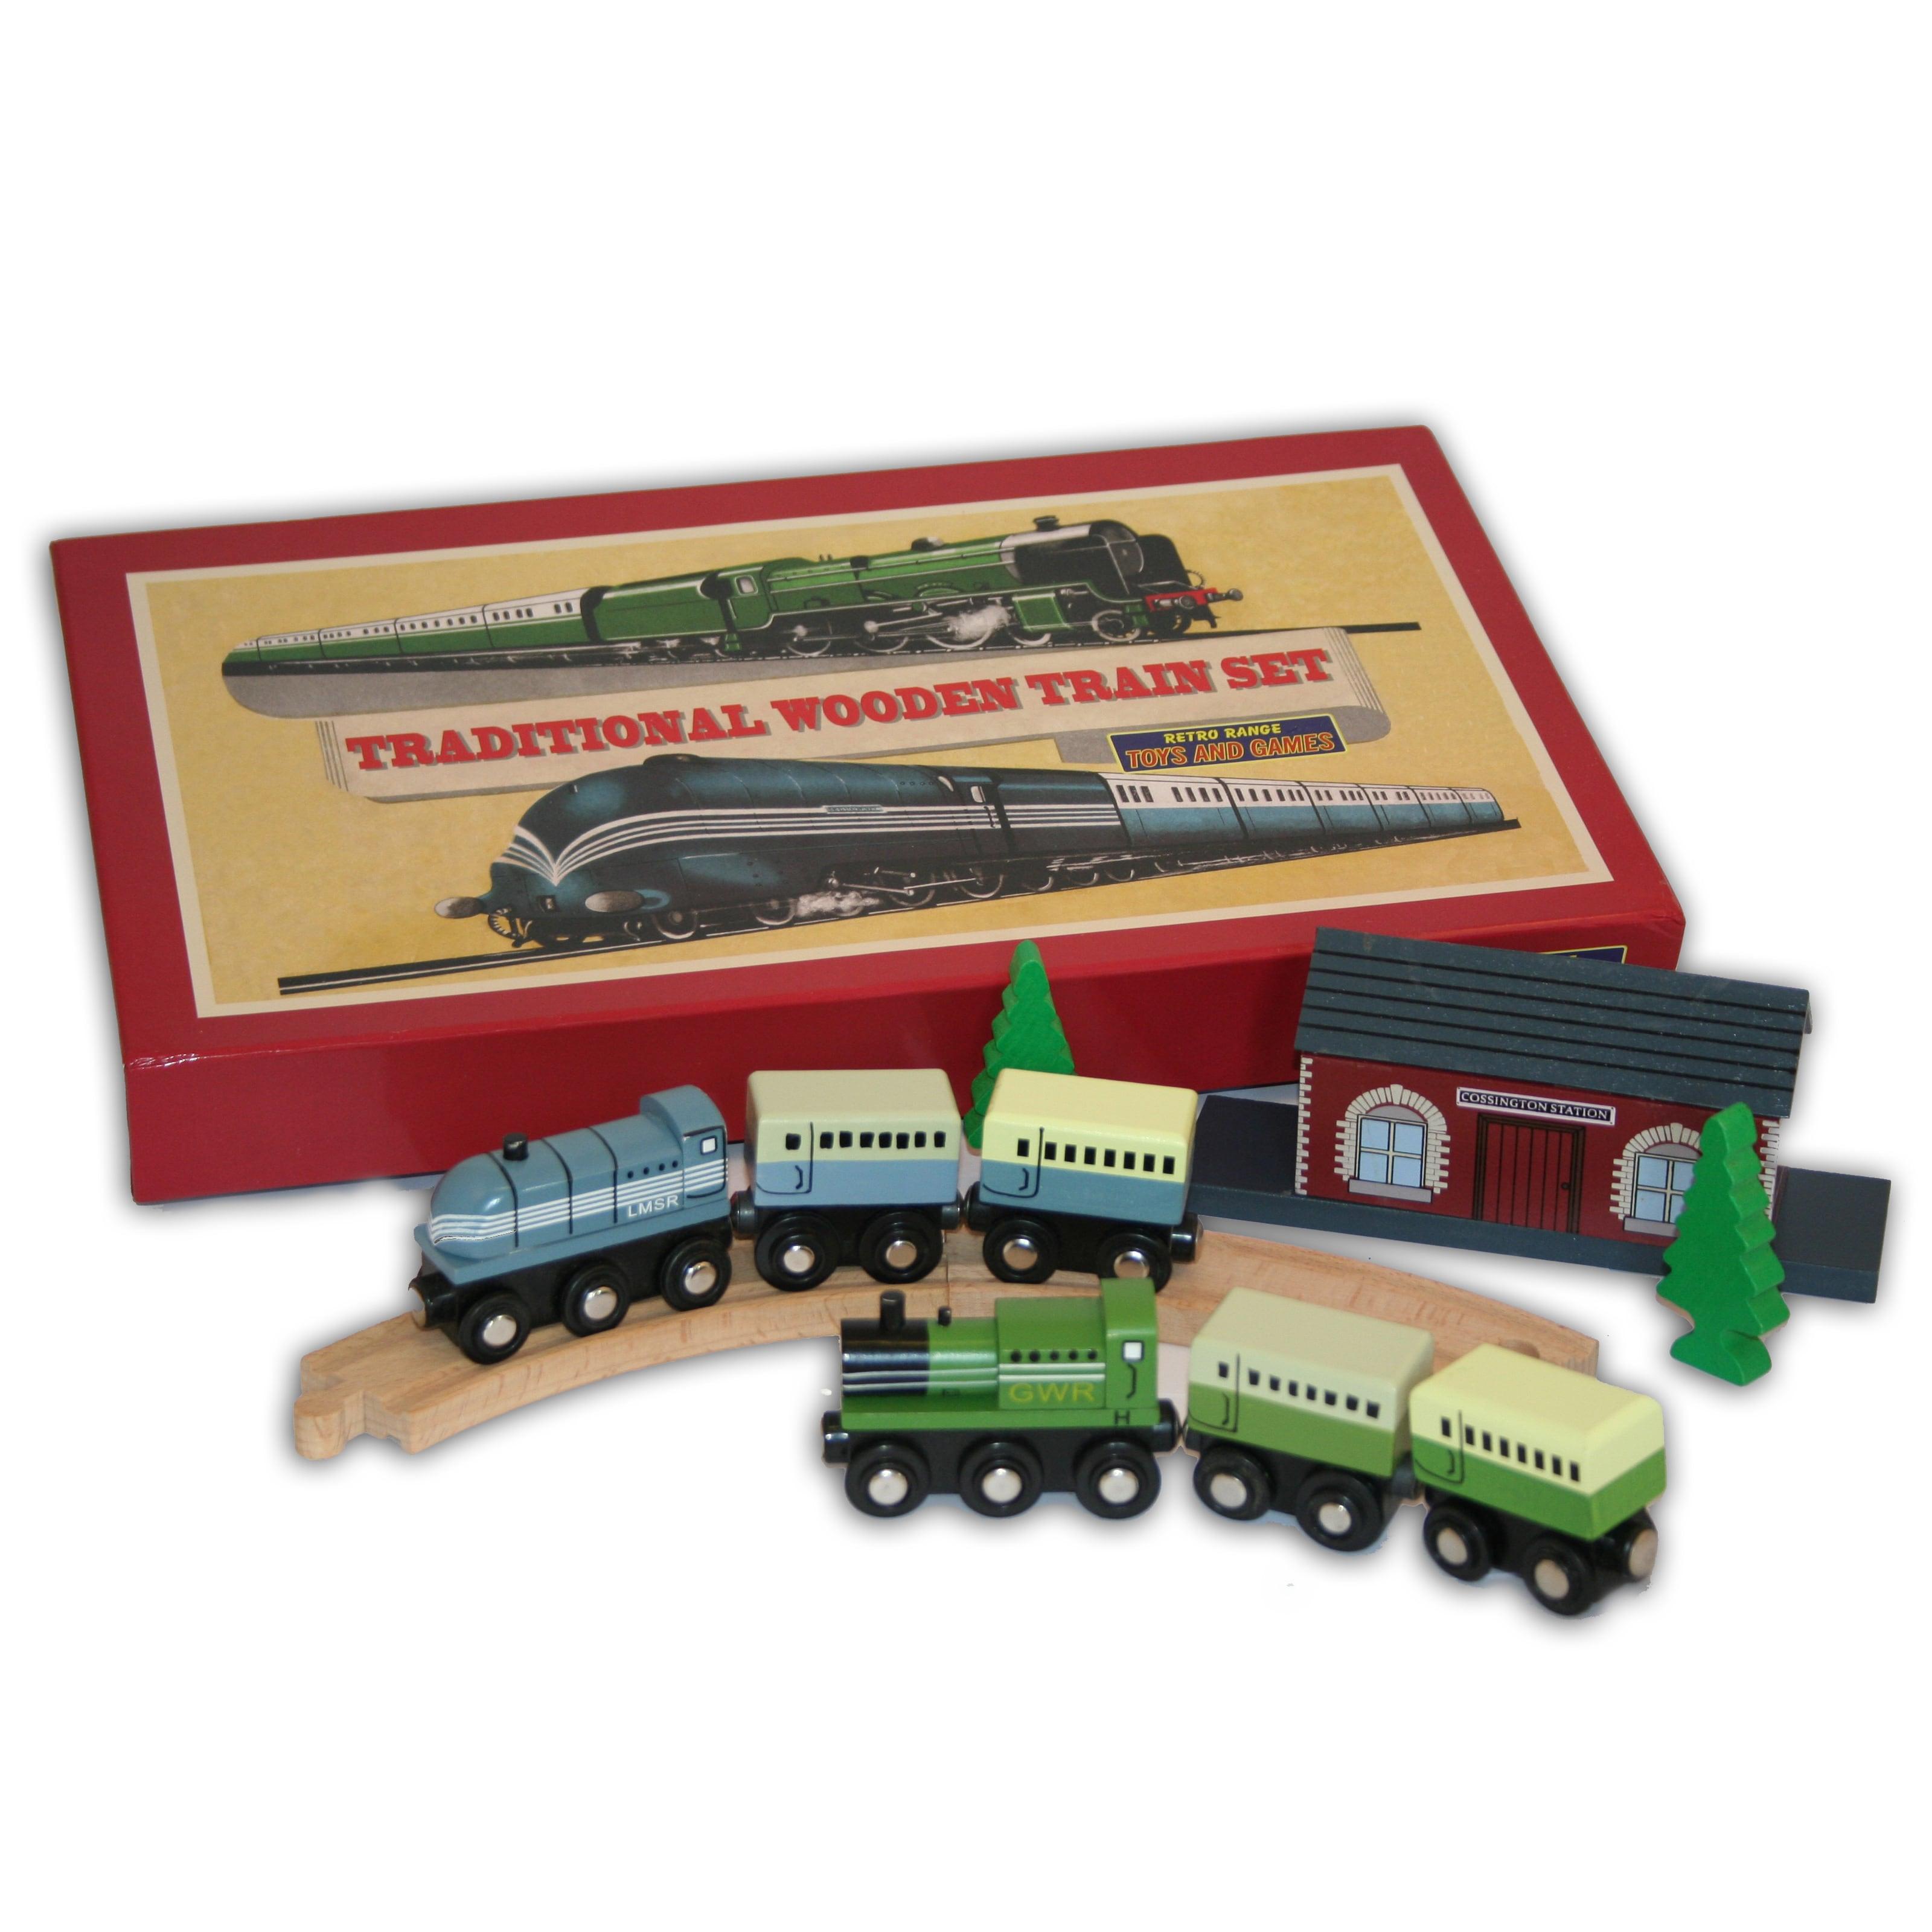 Traditional Wooden Train Set by Perisphere & Trylon